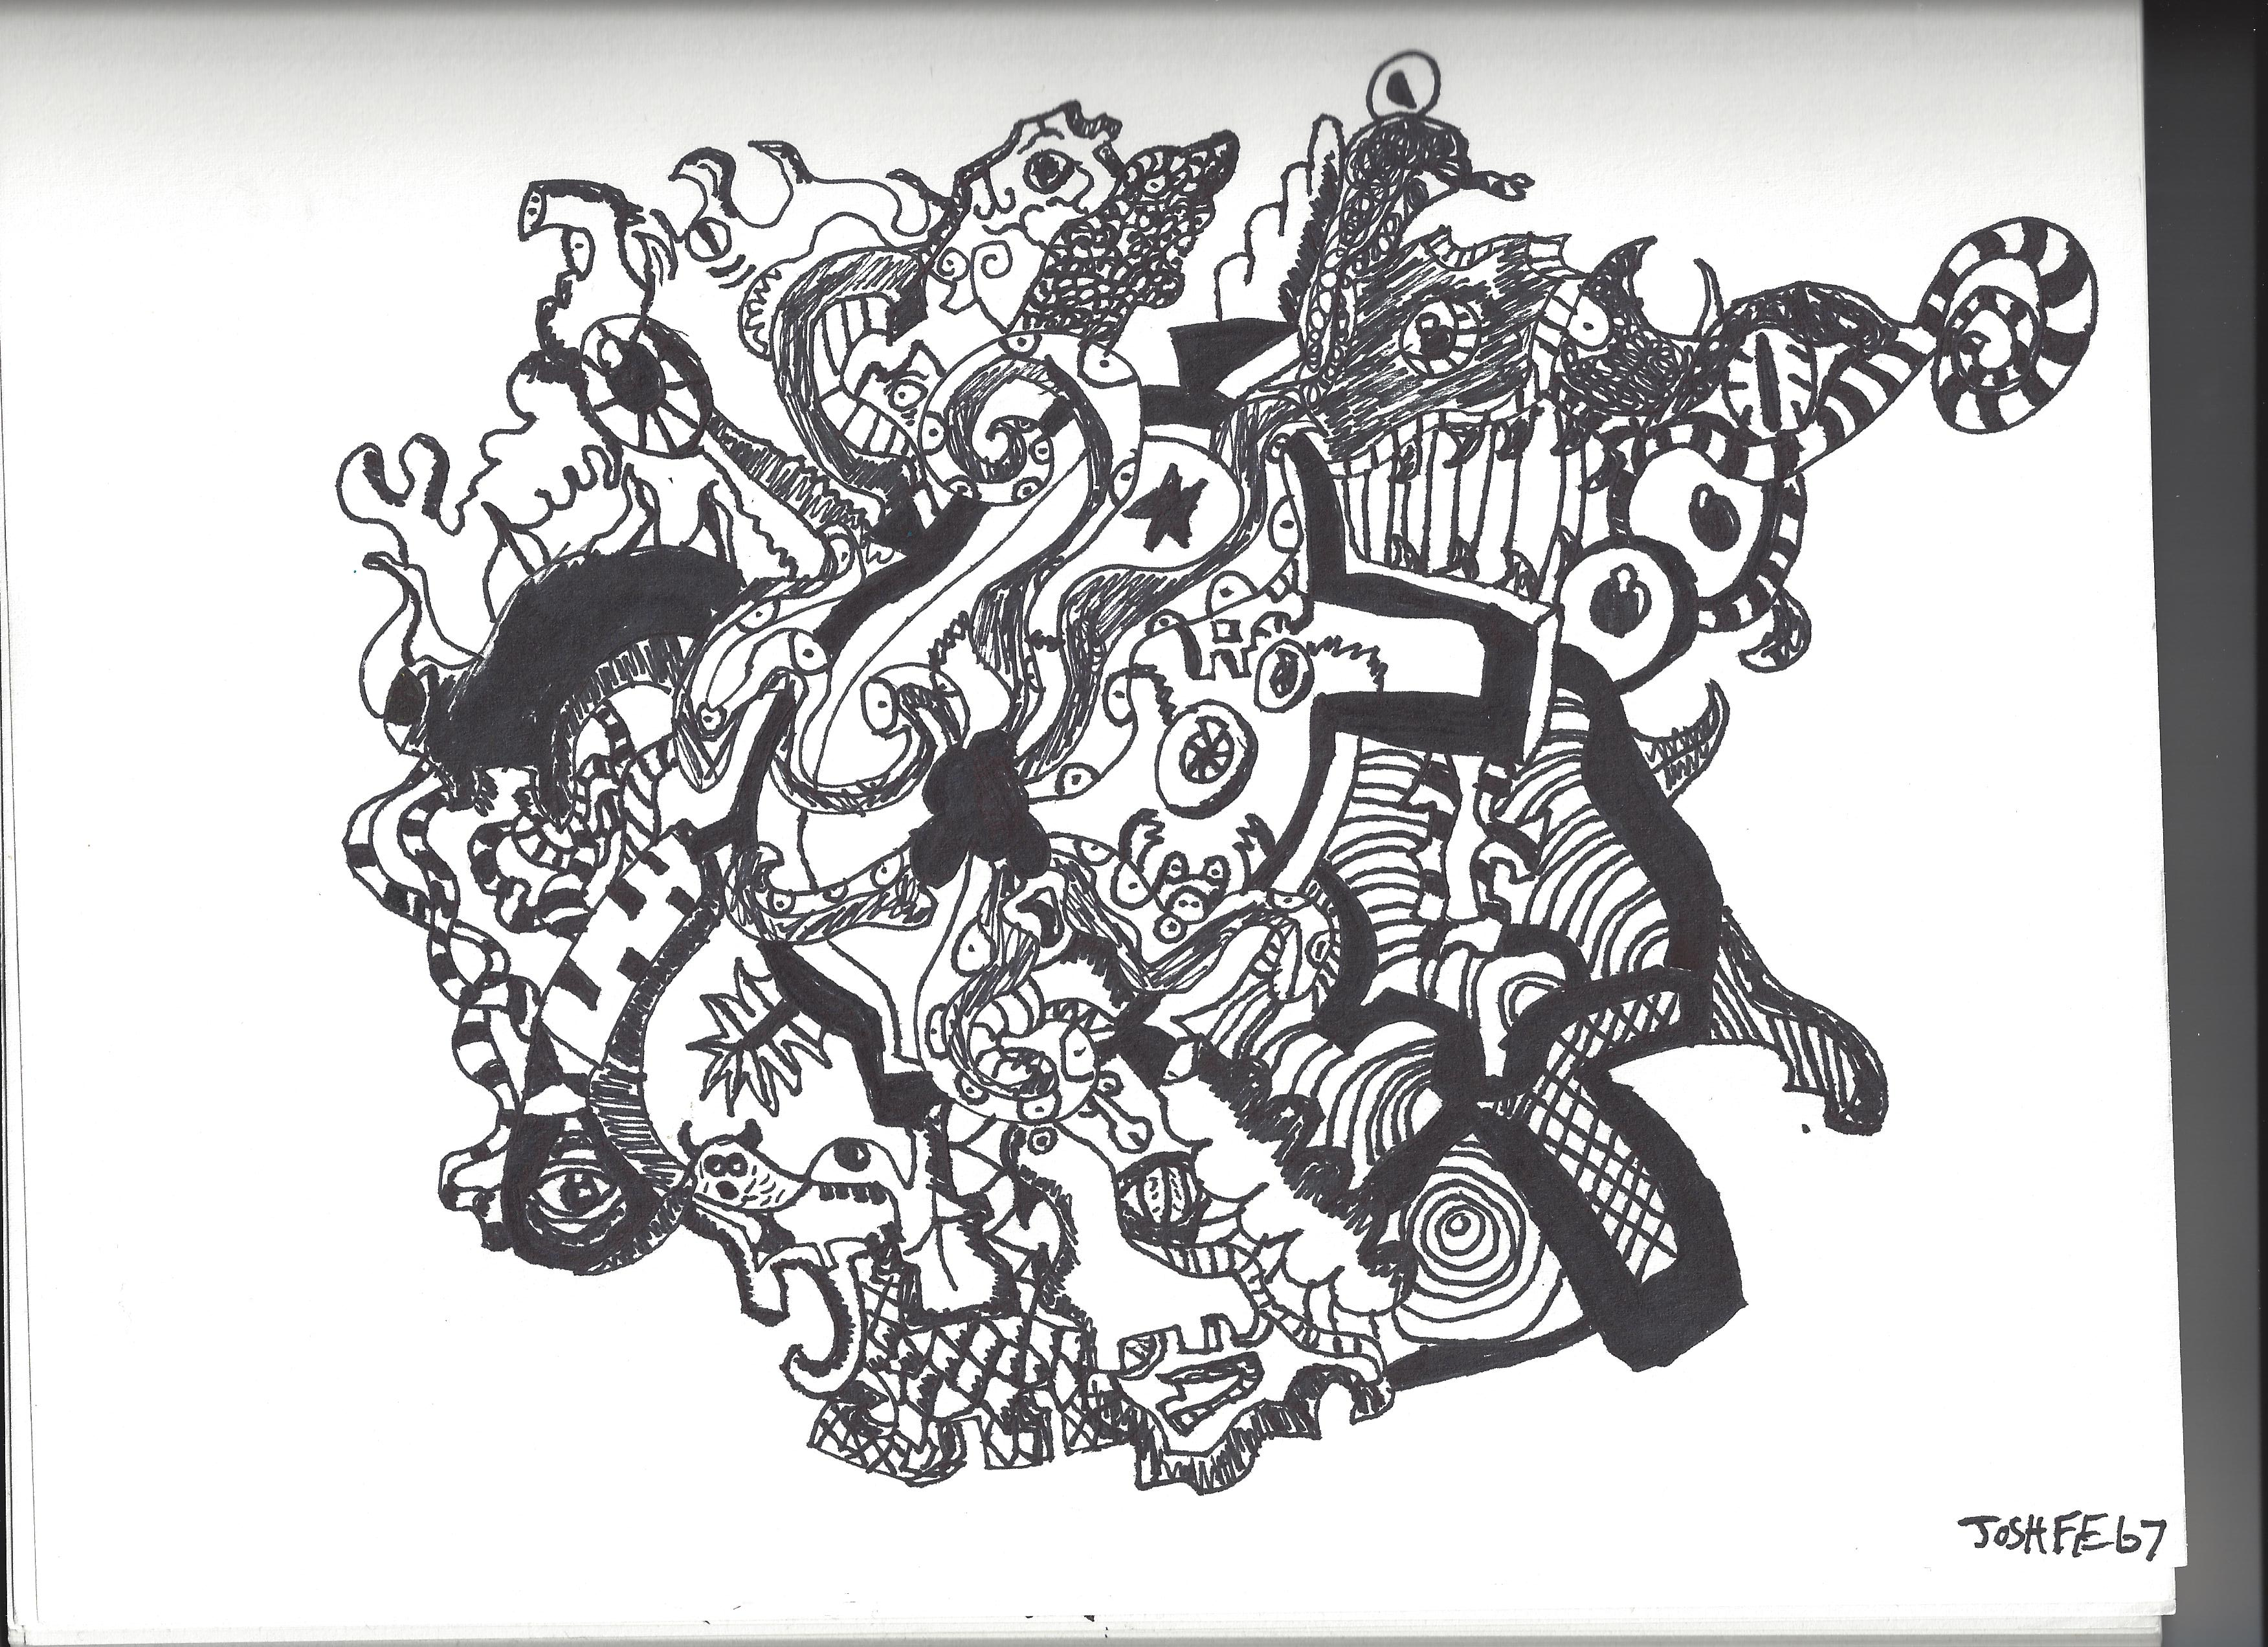 98 Abstract Drawing Ideas Tumblr Abstract Drawing Ideas Tumblr